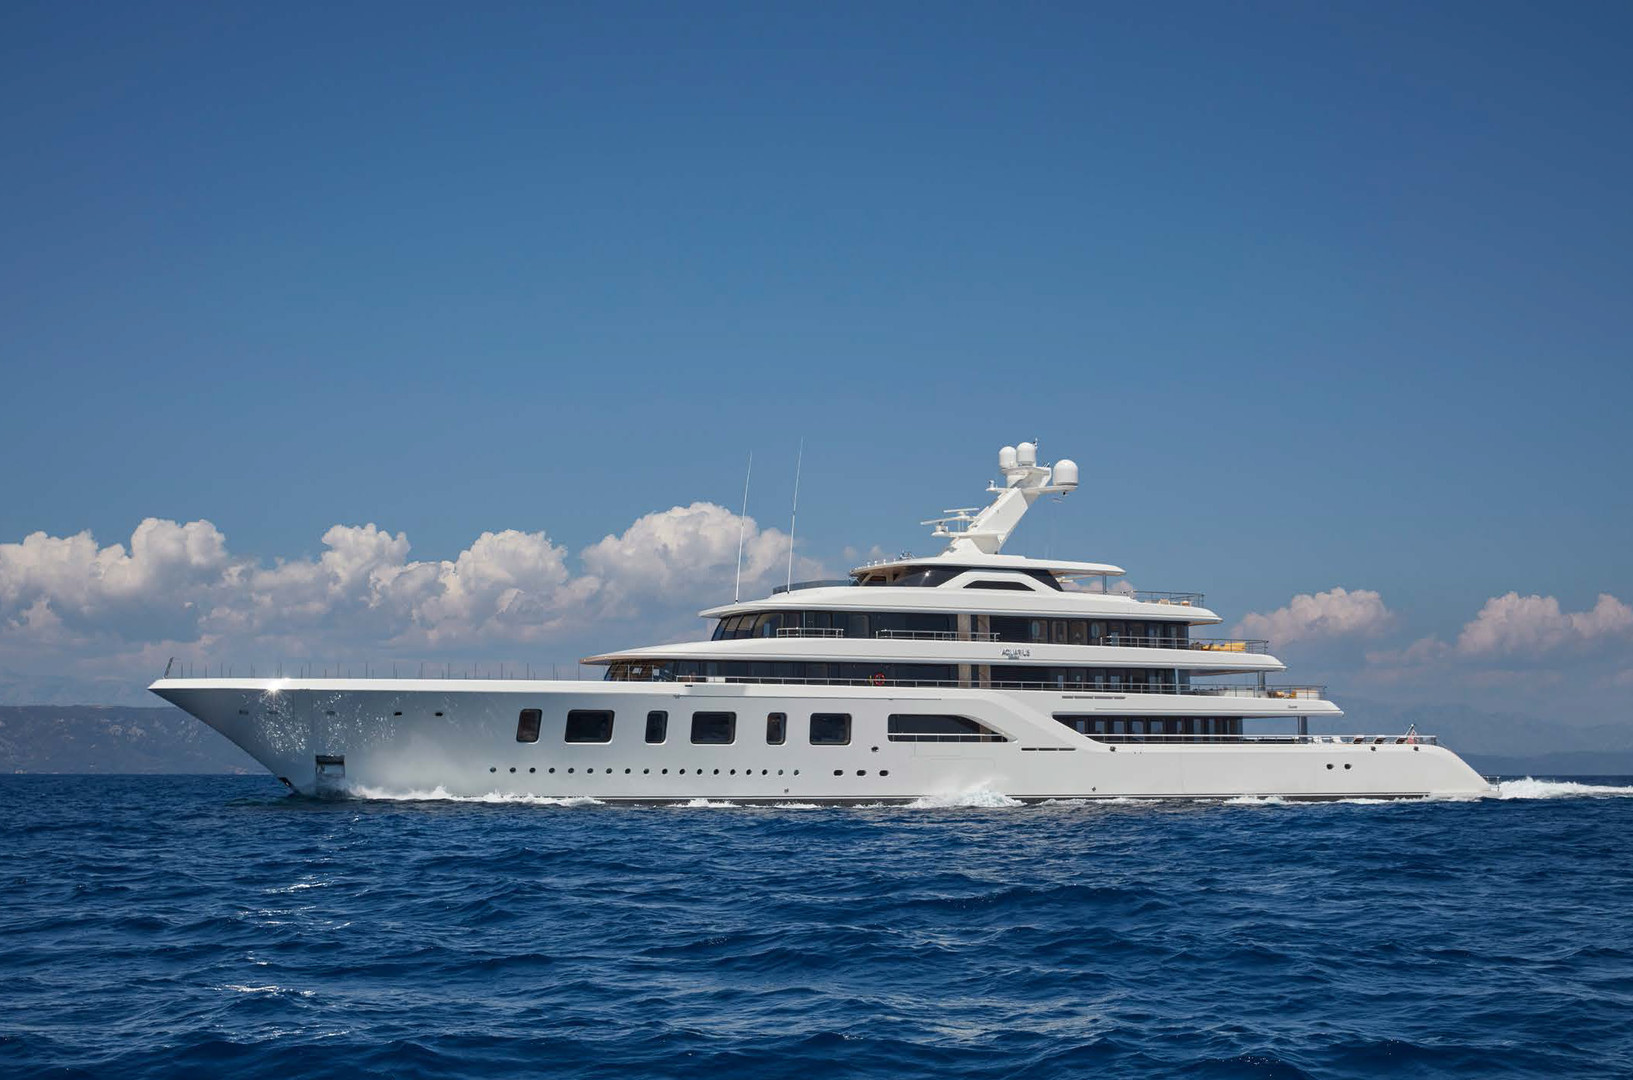 Yacht AQUARIUS - on charter